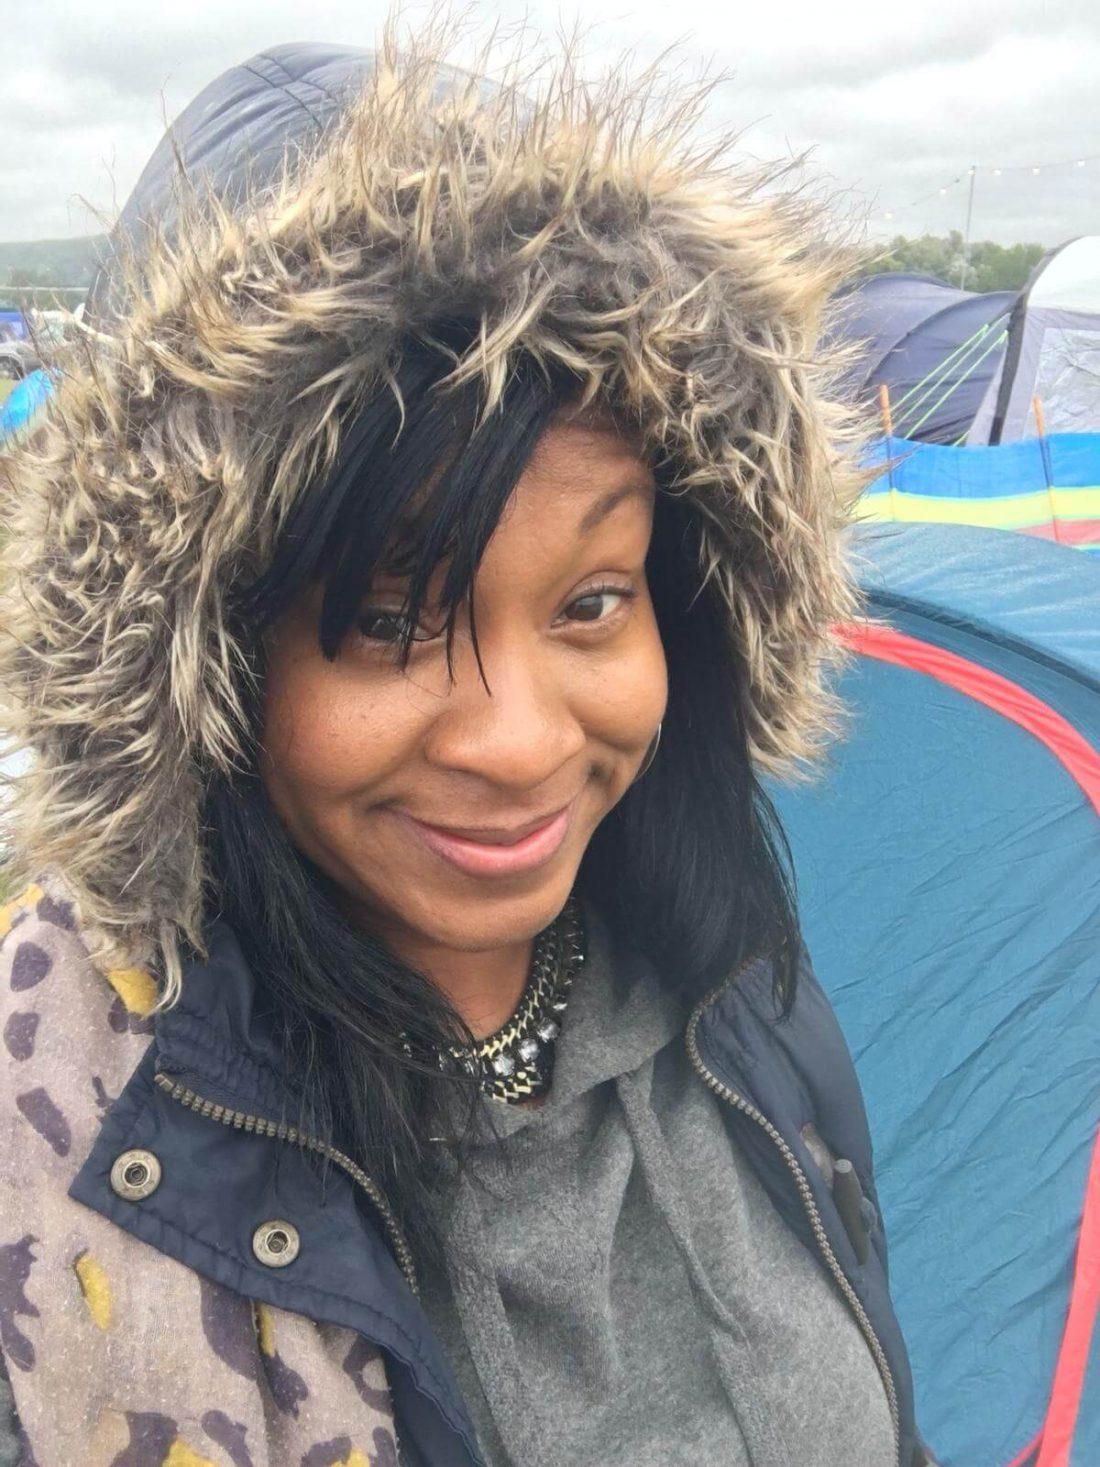 Camping Black woman